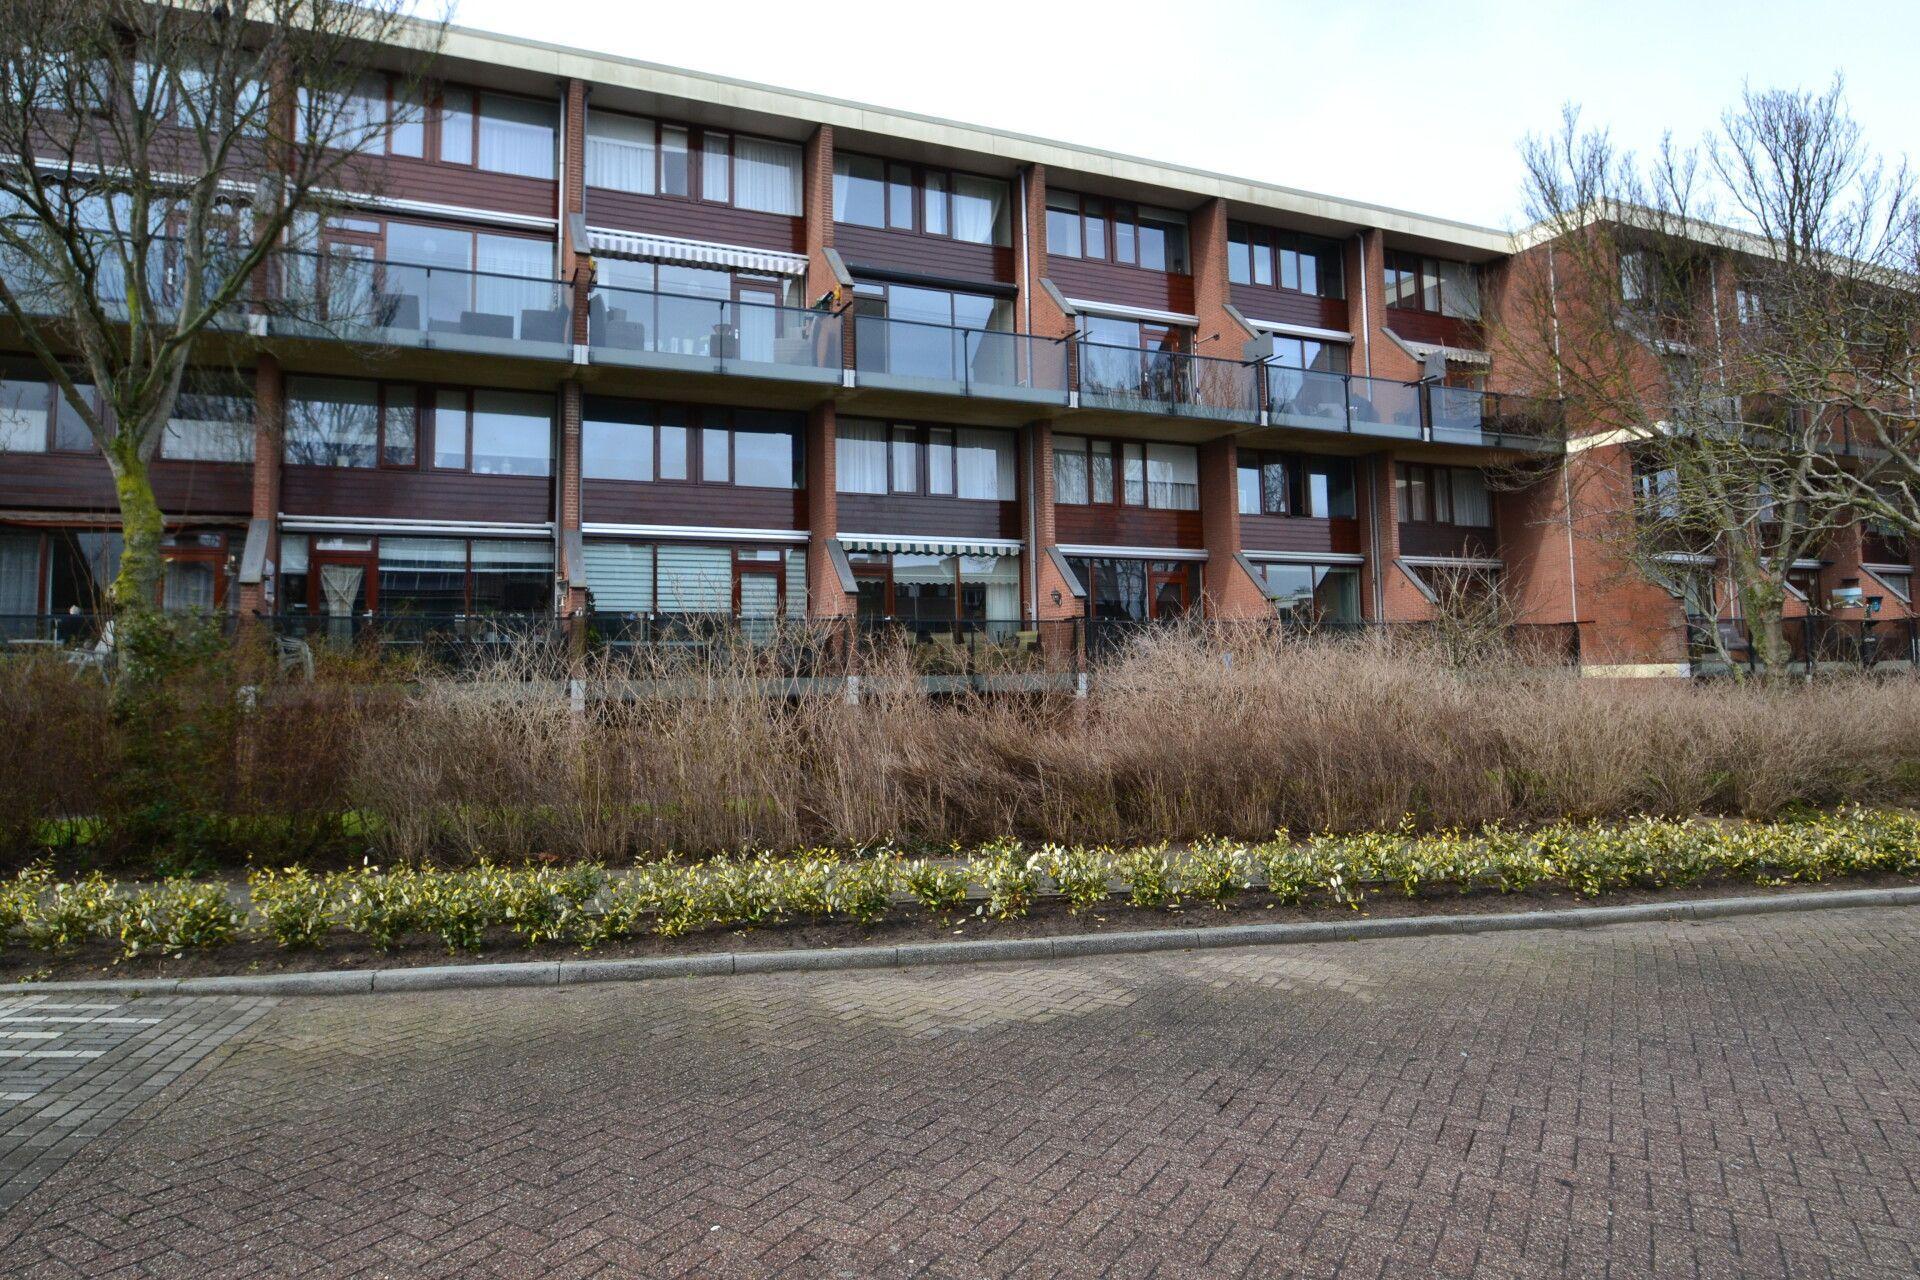 Appartement Willy Sluiterstraat 71  bis 6/7 Person  in den Niederlande